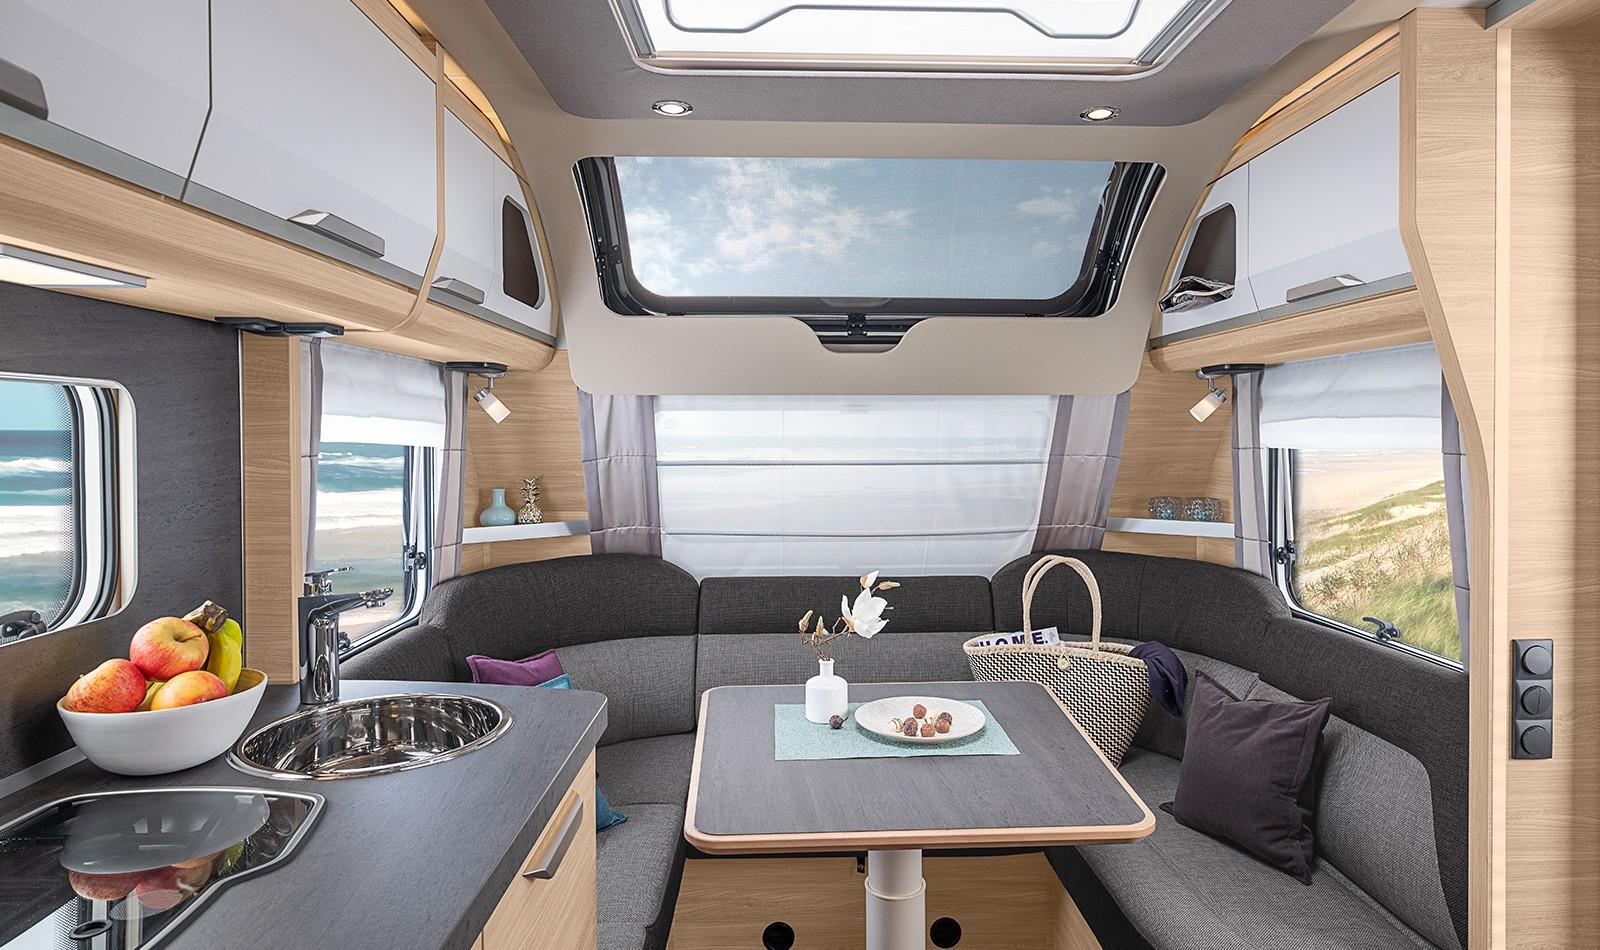 knaus s dwind 2019 compleet vernieuwd reinders rekreatie. Black Bedroom Furniture Sets. Home Design Ideas